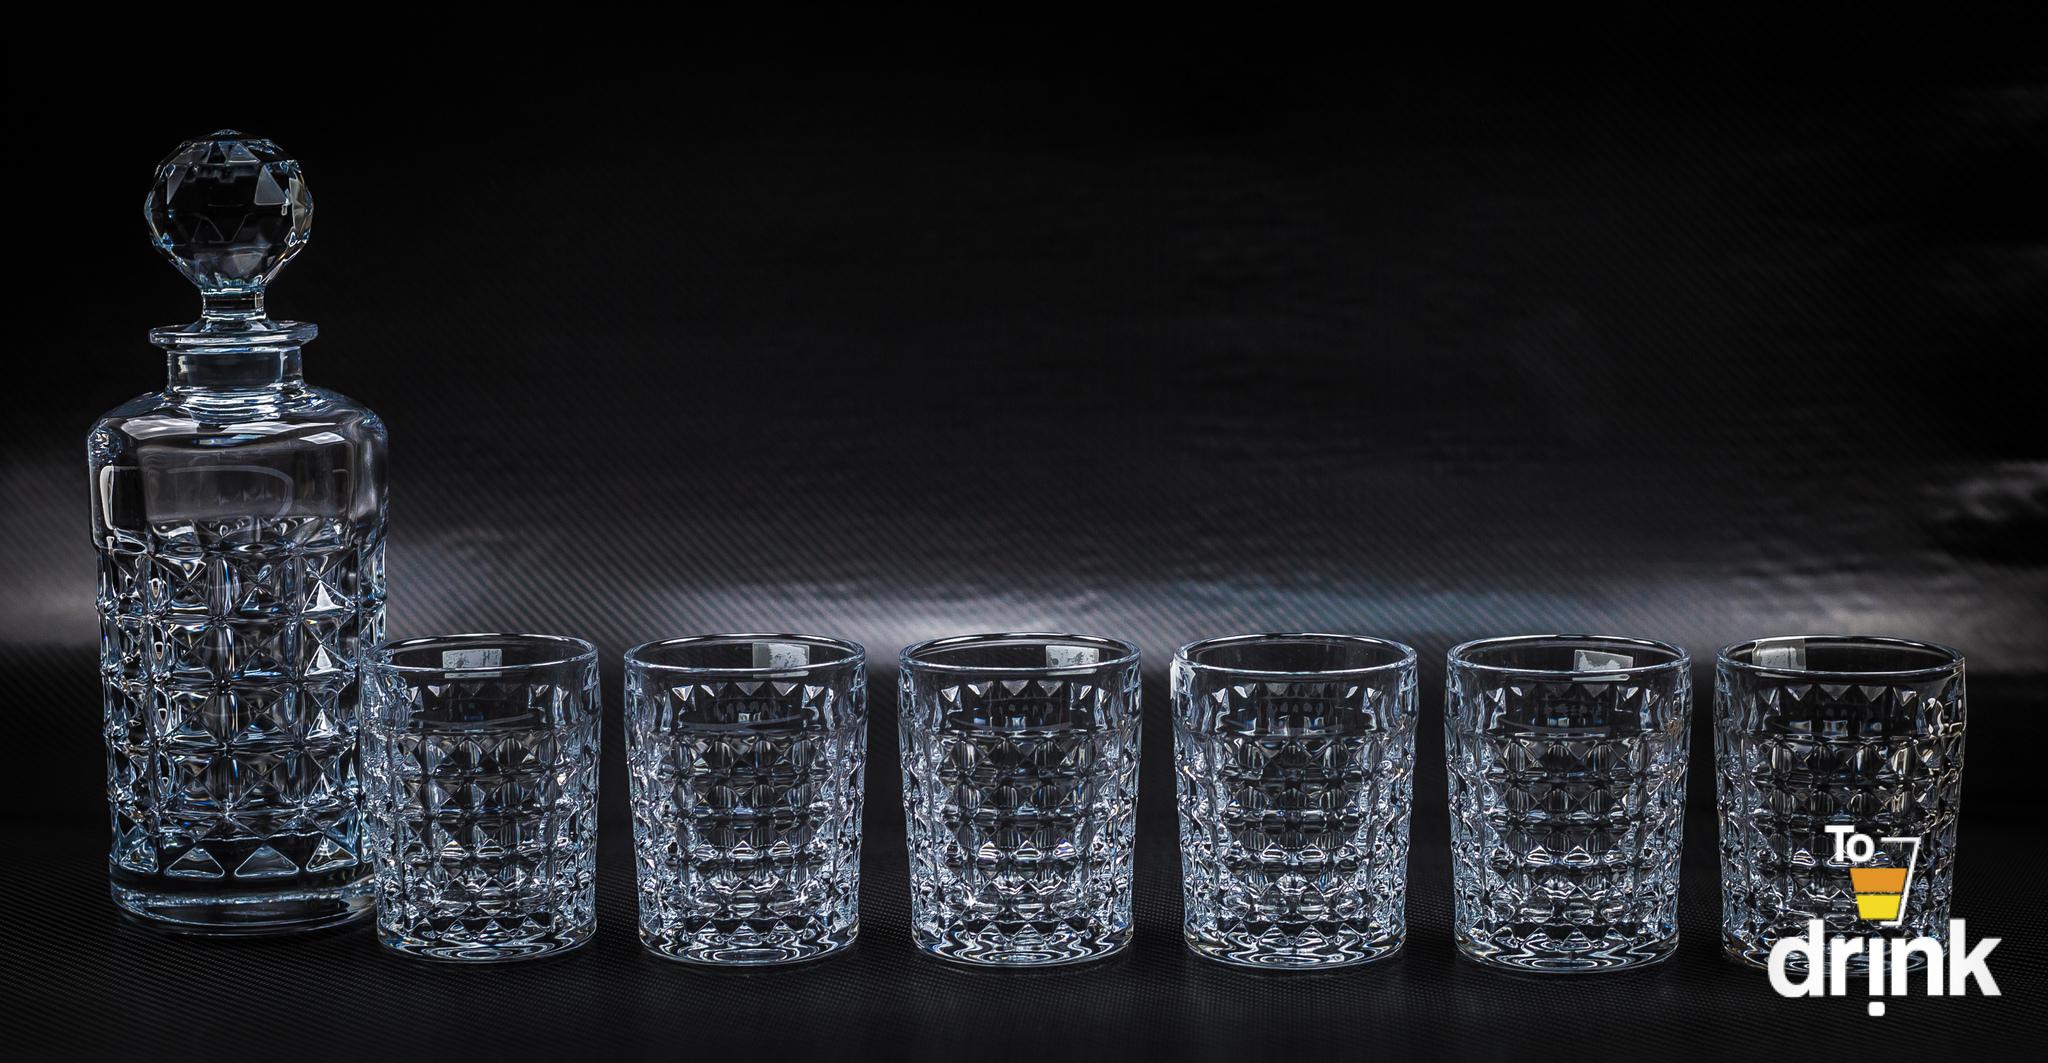 Набор для виски Diamond Bohemia, 1 штоф и 6 стаканов набор стаканов для виски 6 шт bohemia набор стаканов для виски 6 шт